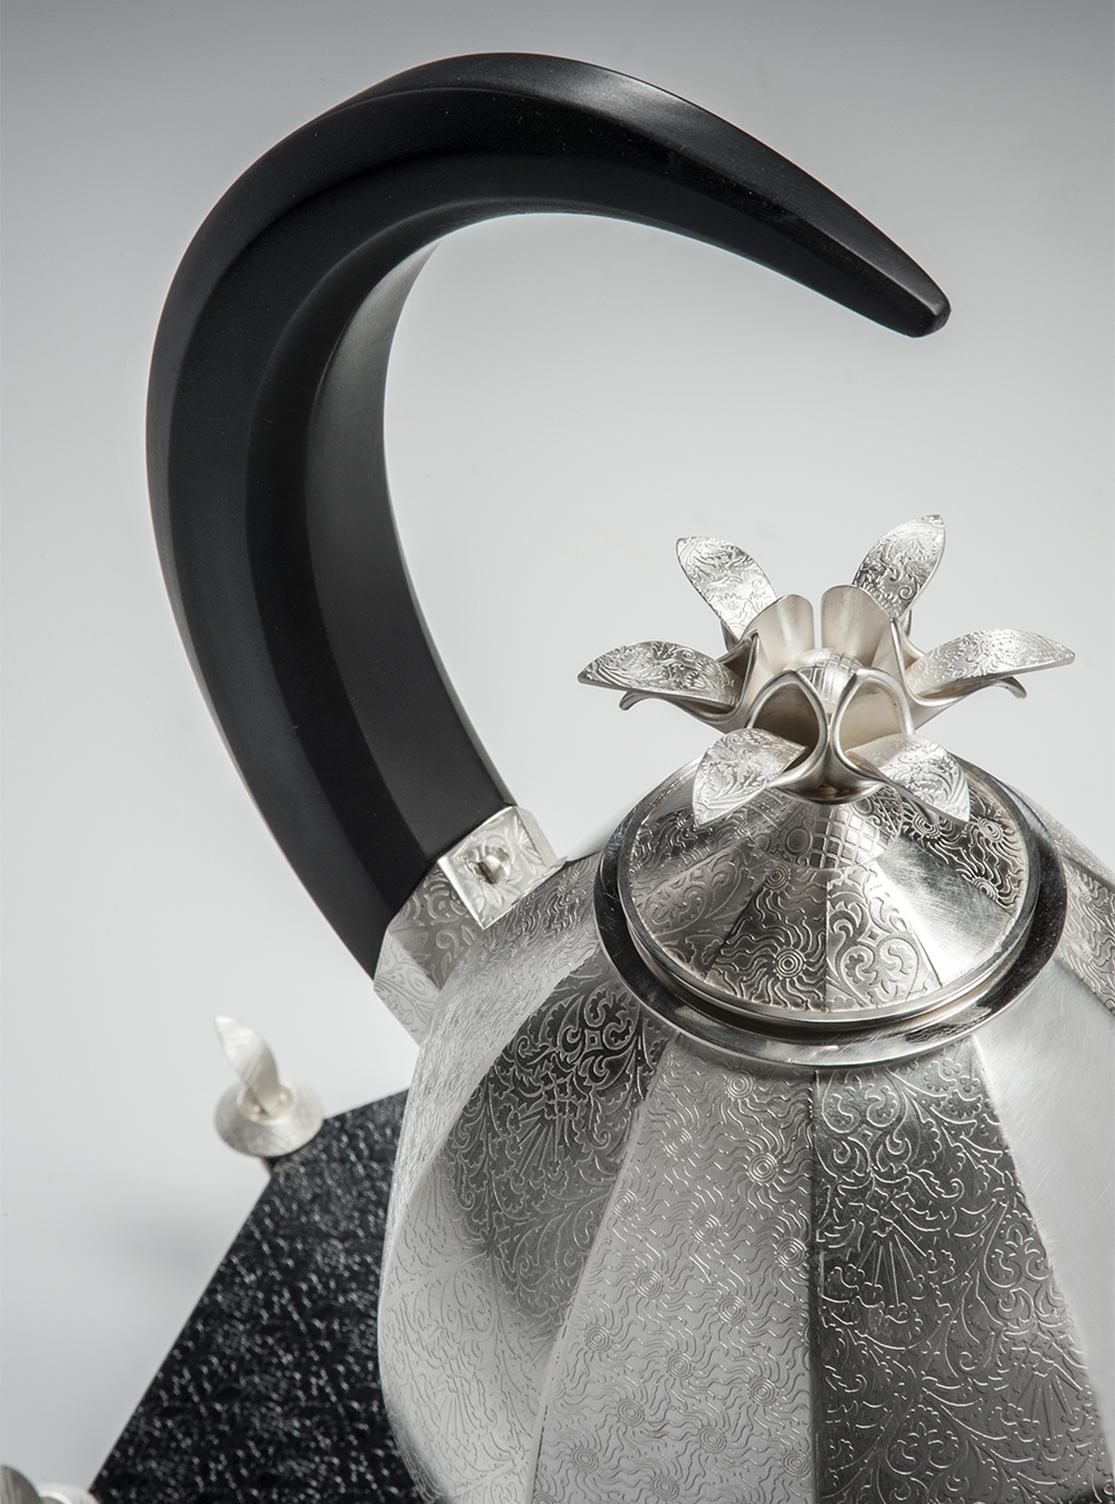 Slippers Teapot - detail